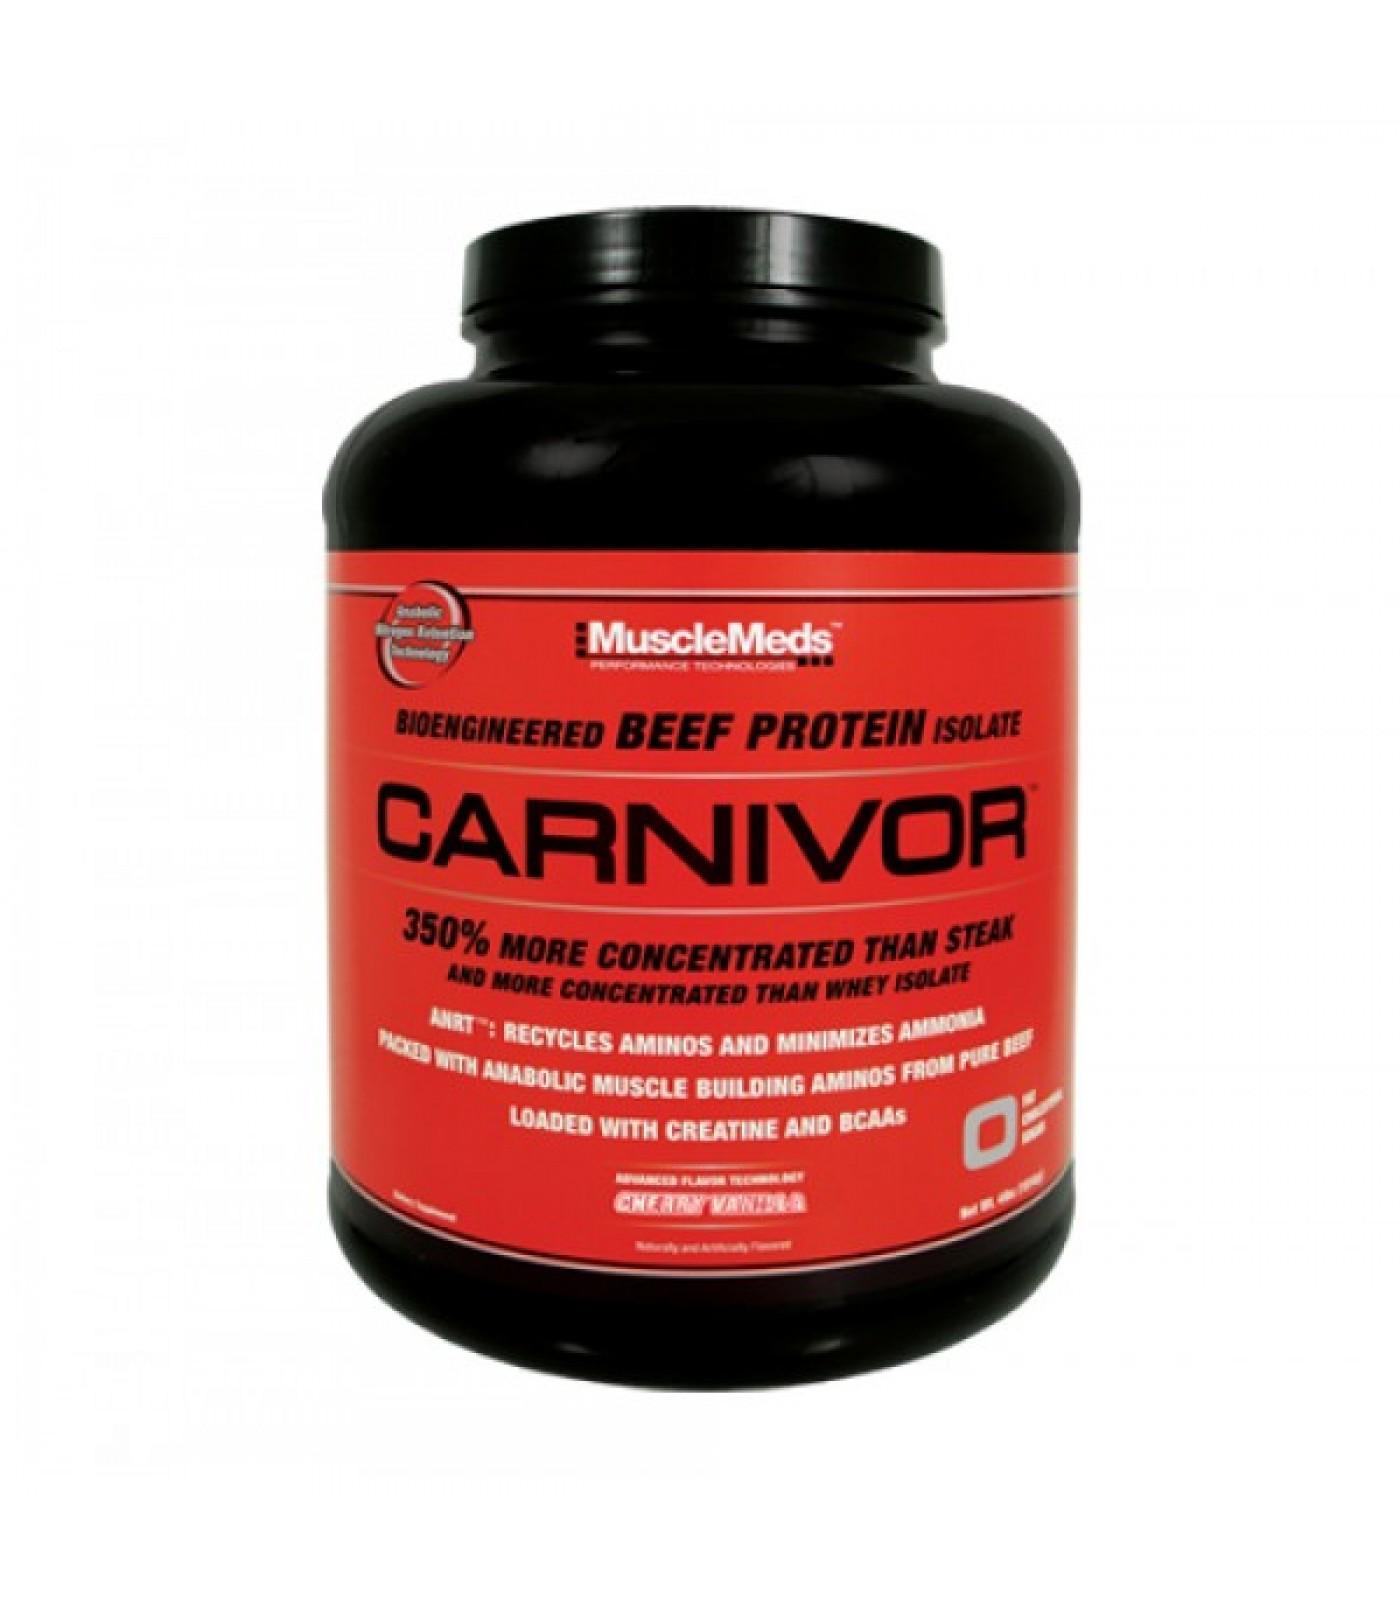 MuscleMeds - Carnivor / 4 lbs.